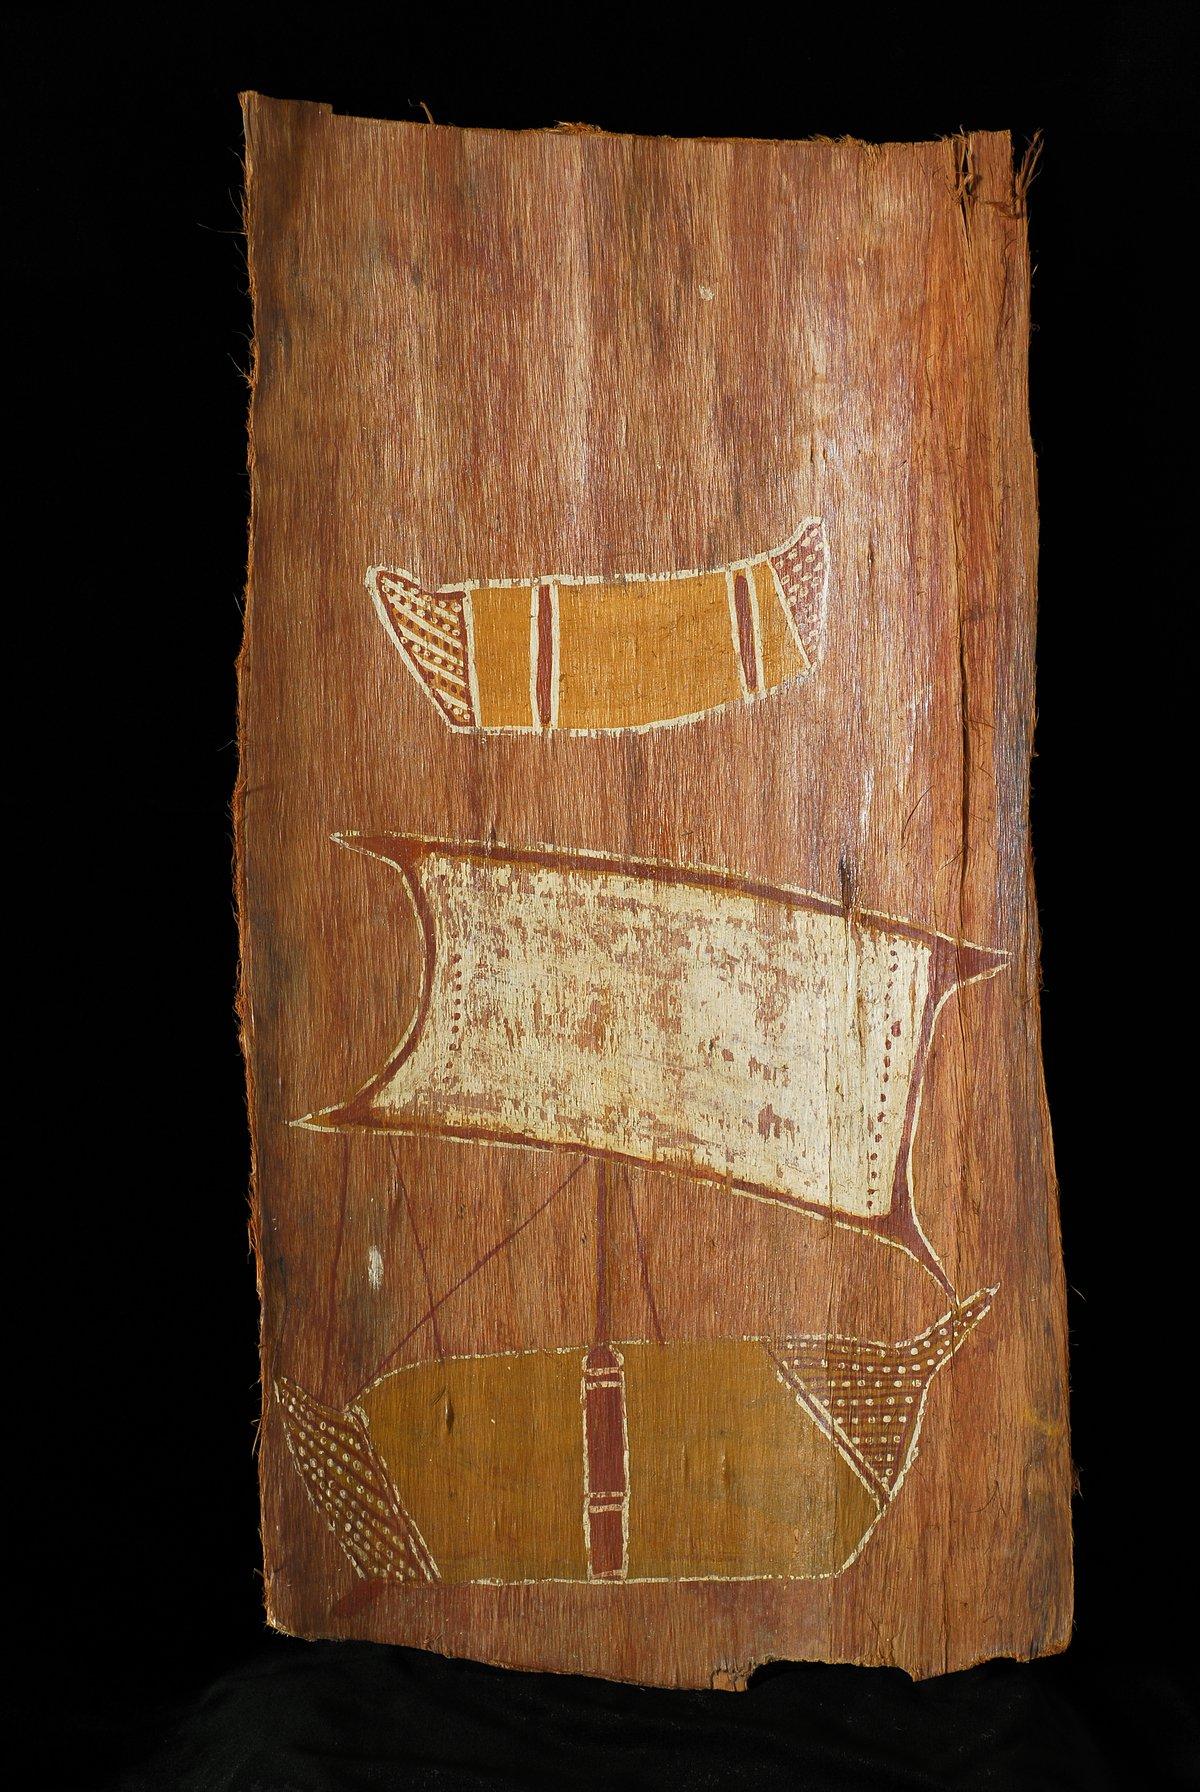 Bark painting from Arnhem Land, 1930s - The Australian Museum